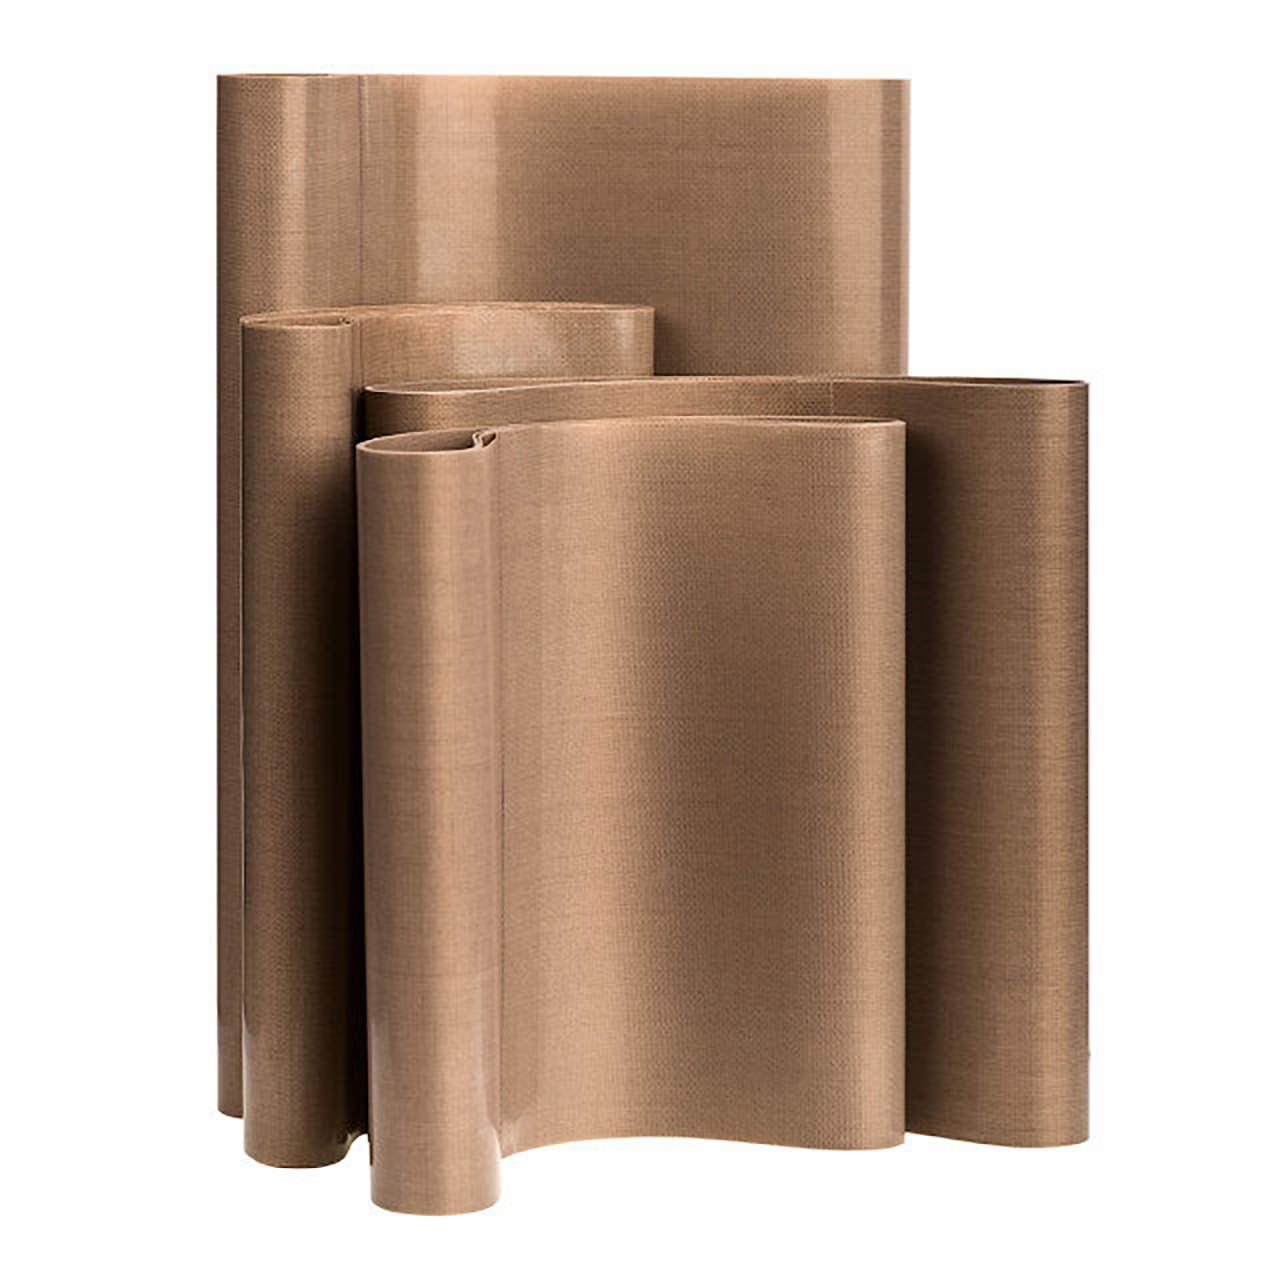 Тефлоновый ремень 230х540 мм для сварки ПВХ